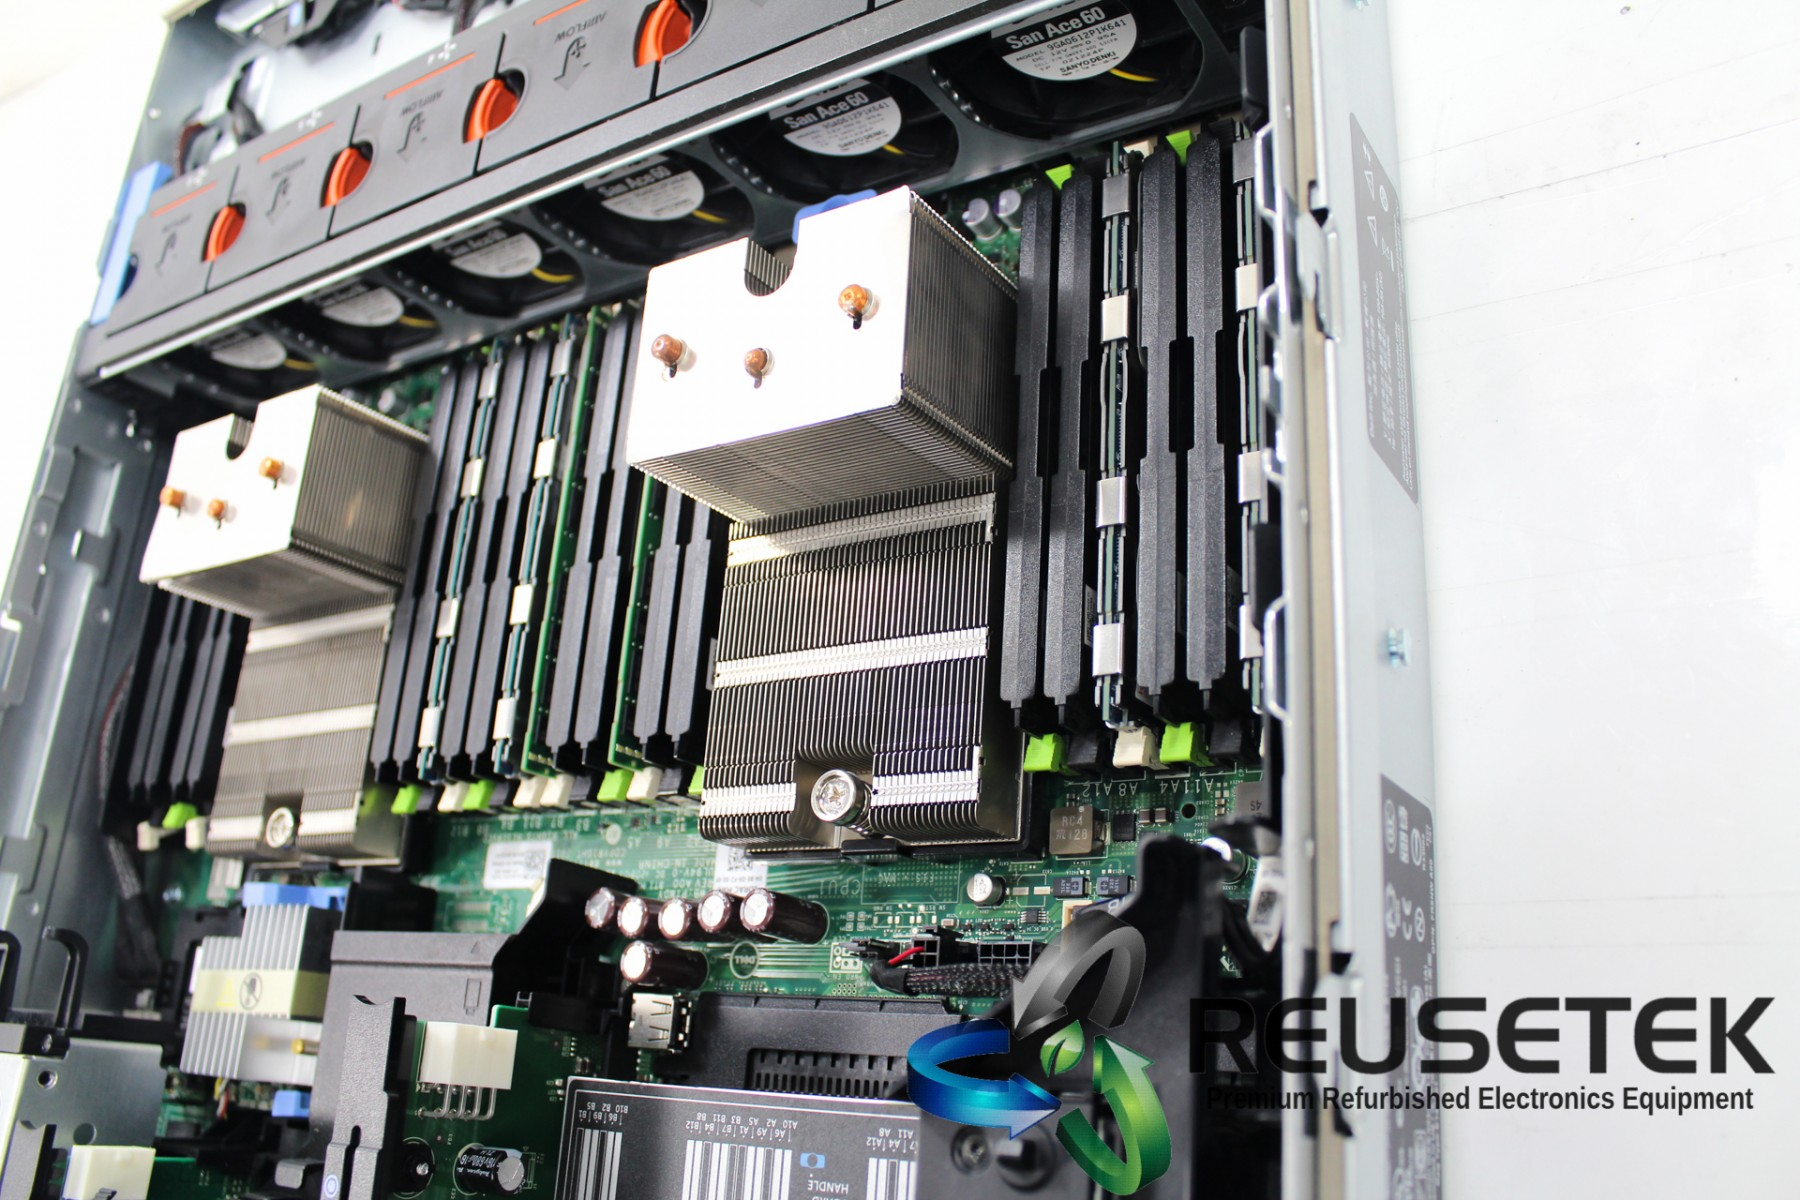 SN12088852-Dell PowerEdge R720 Xeon Six-Core E5-2620 2U Rack Mountable Server-image